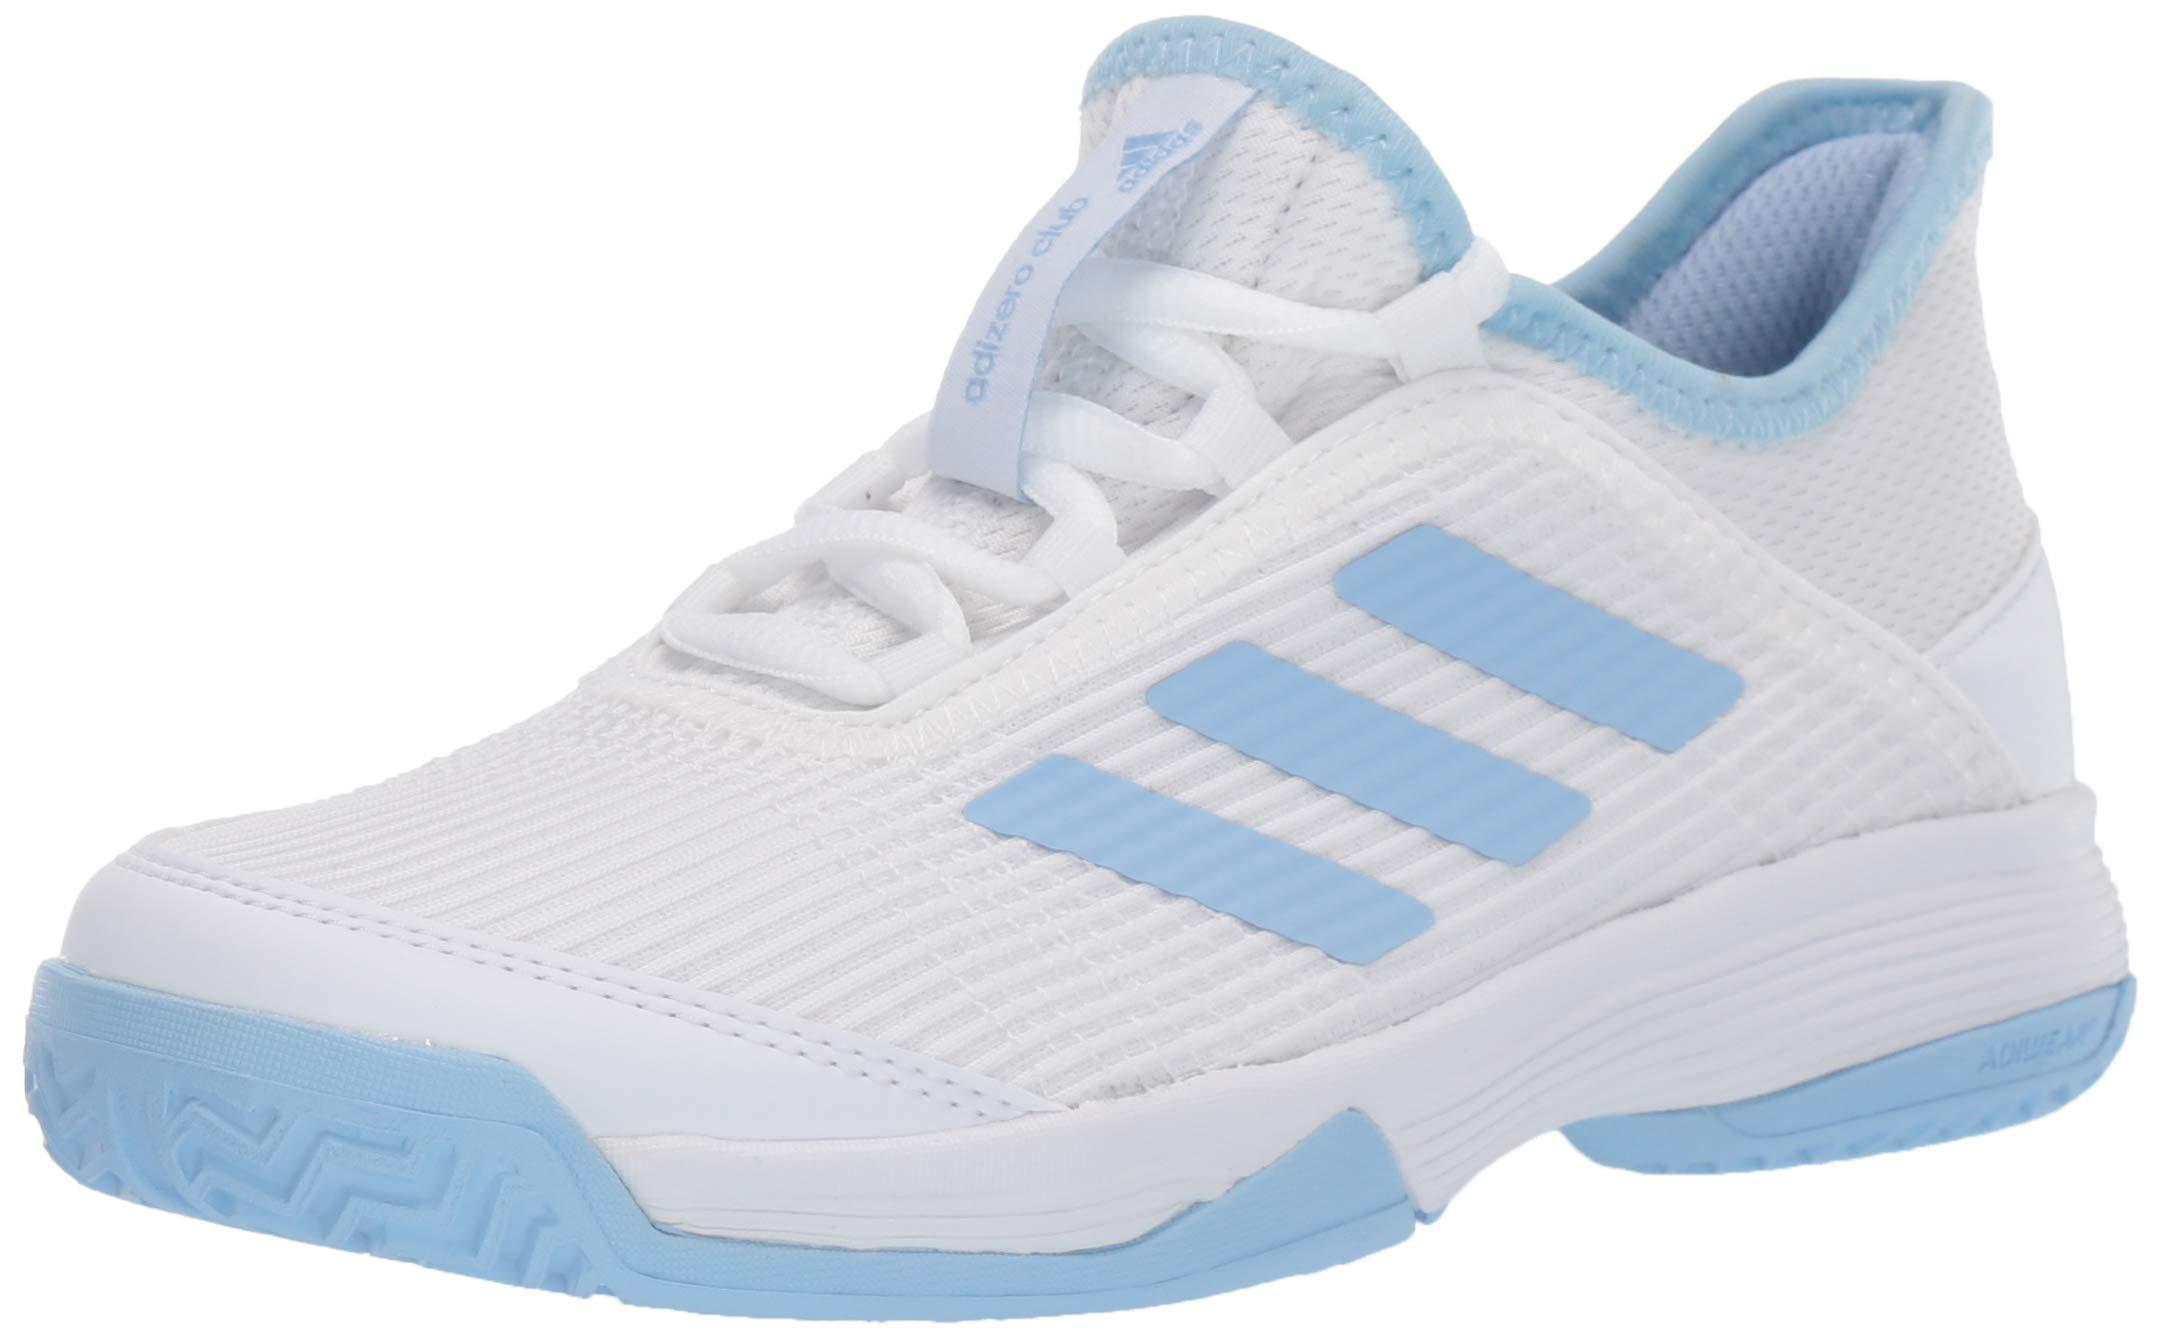 adidas Unisex Adizero Club Tennis Shoe, Glow Blue/White, 13K M US Little Kid